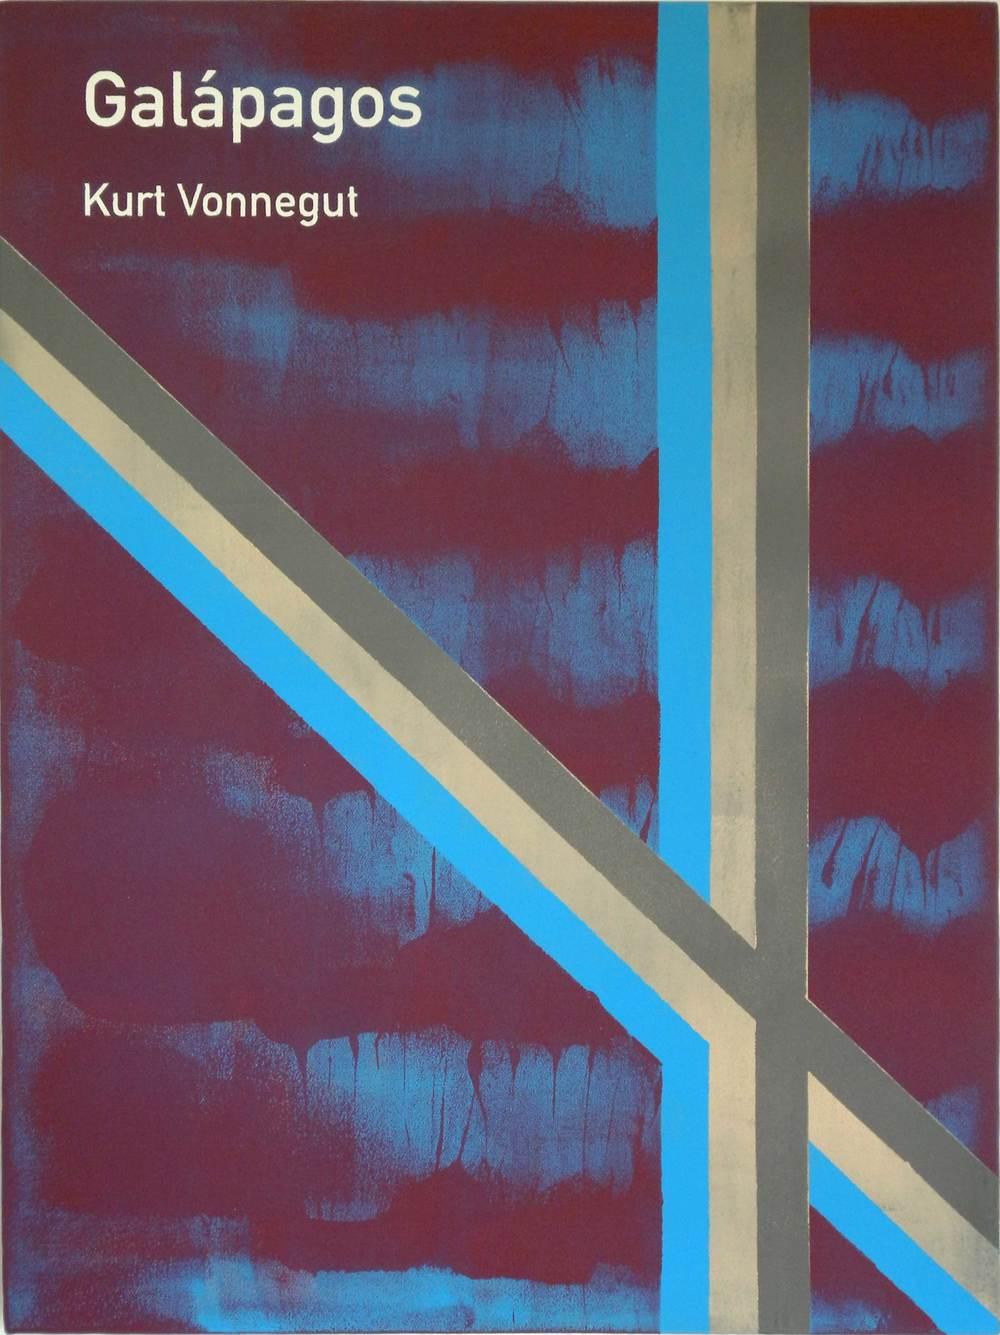 Heman CHONG  Galápagos / Kurt Vonnegut  2012 Acrylic on canvas 61 x 46 x 3.5 cm